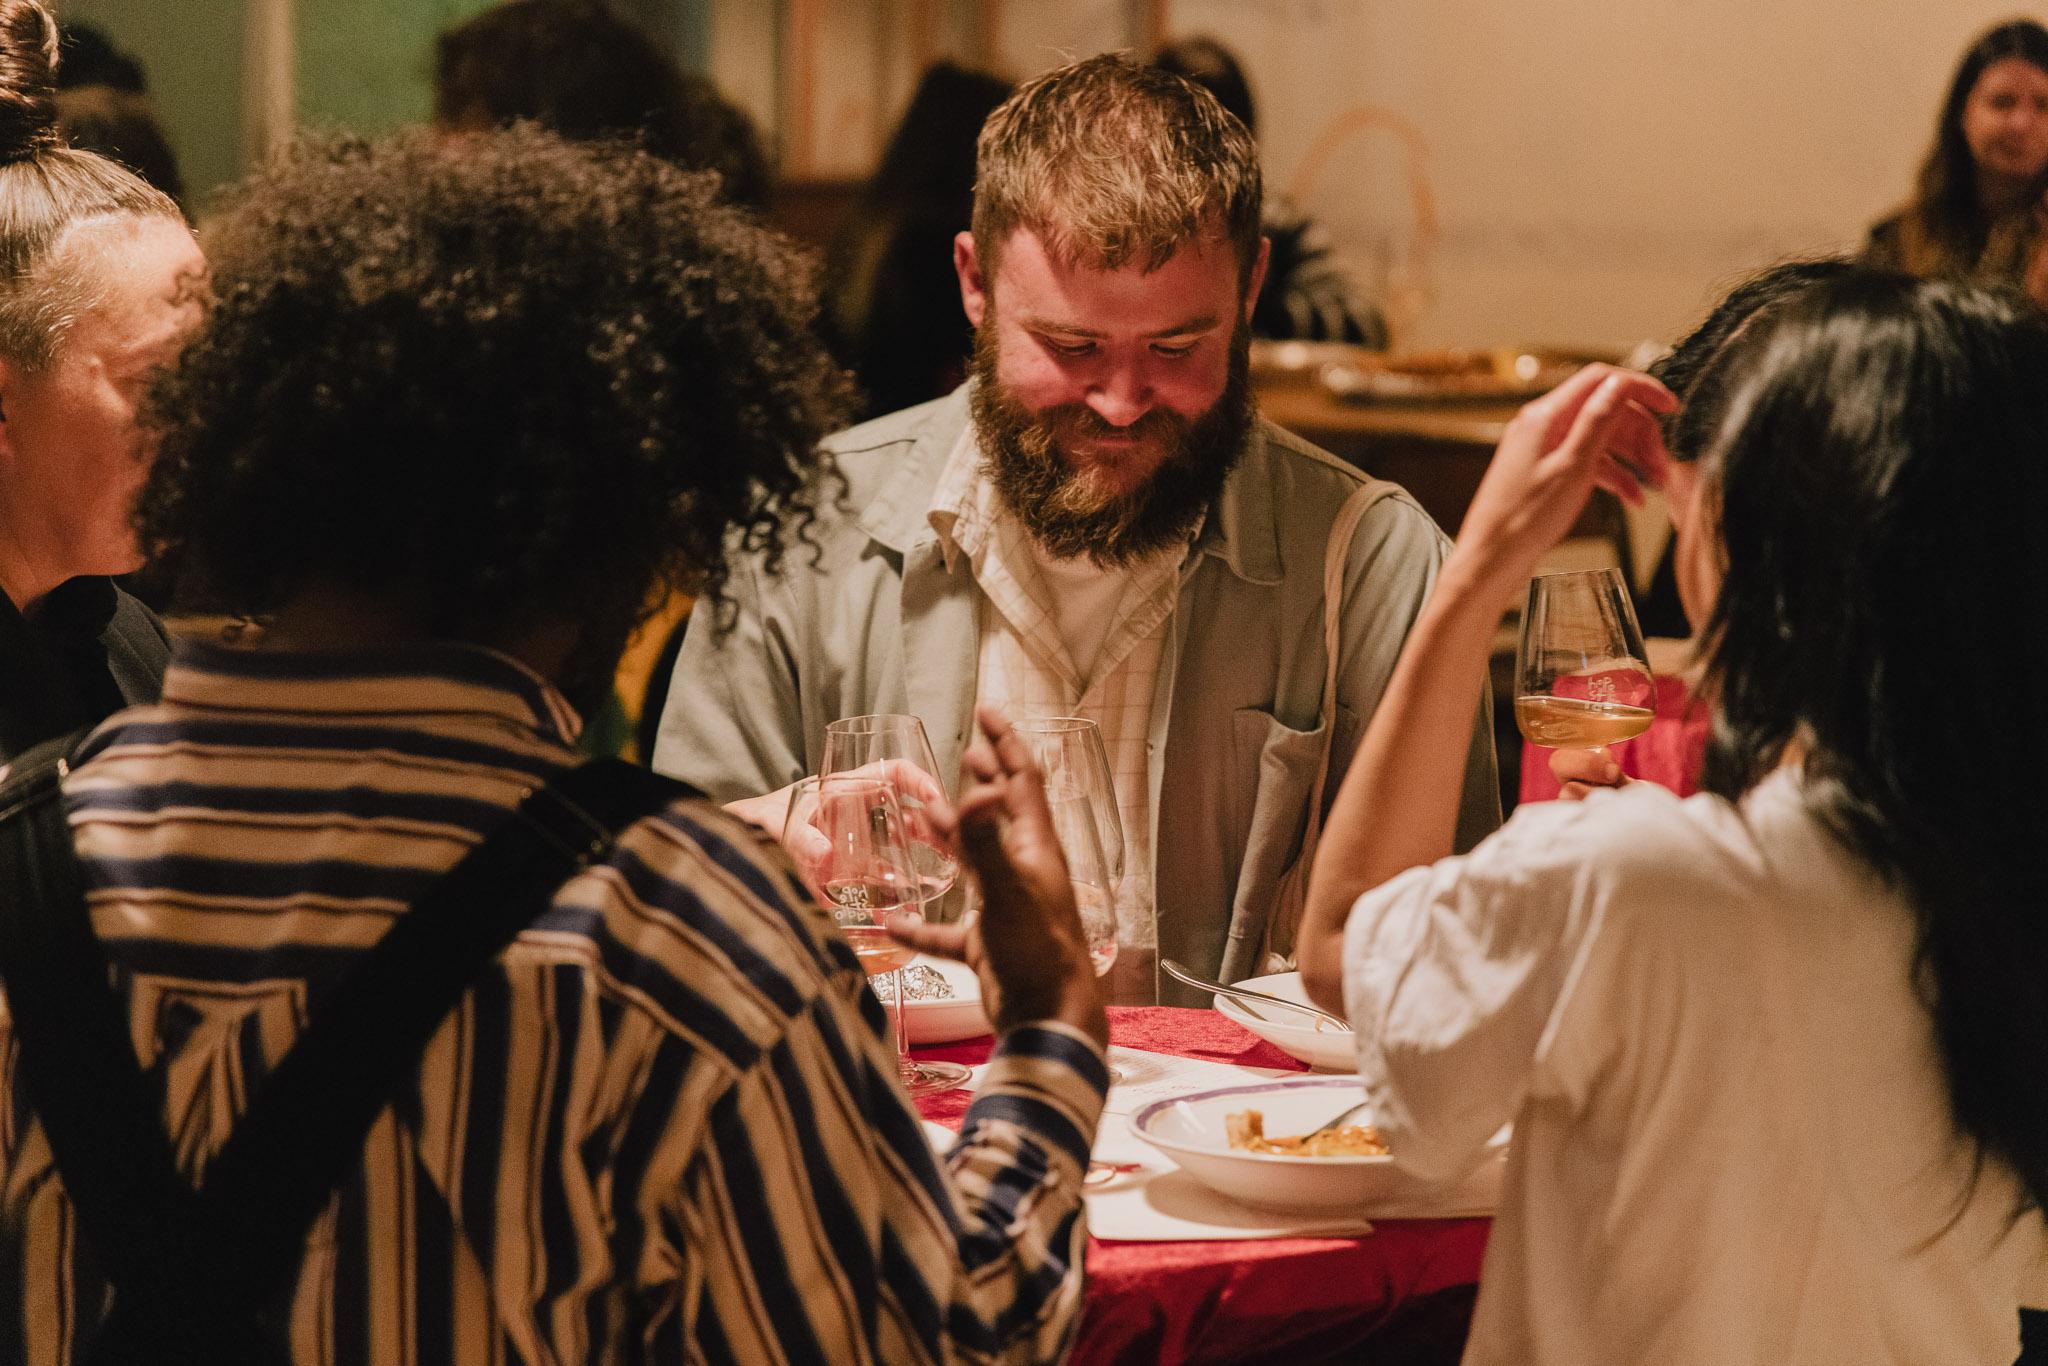 Image of three people eating dinner